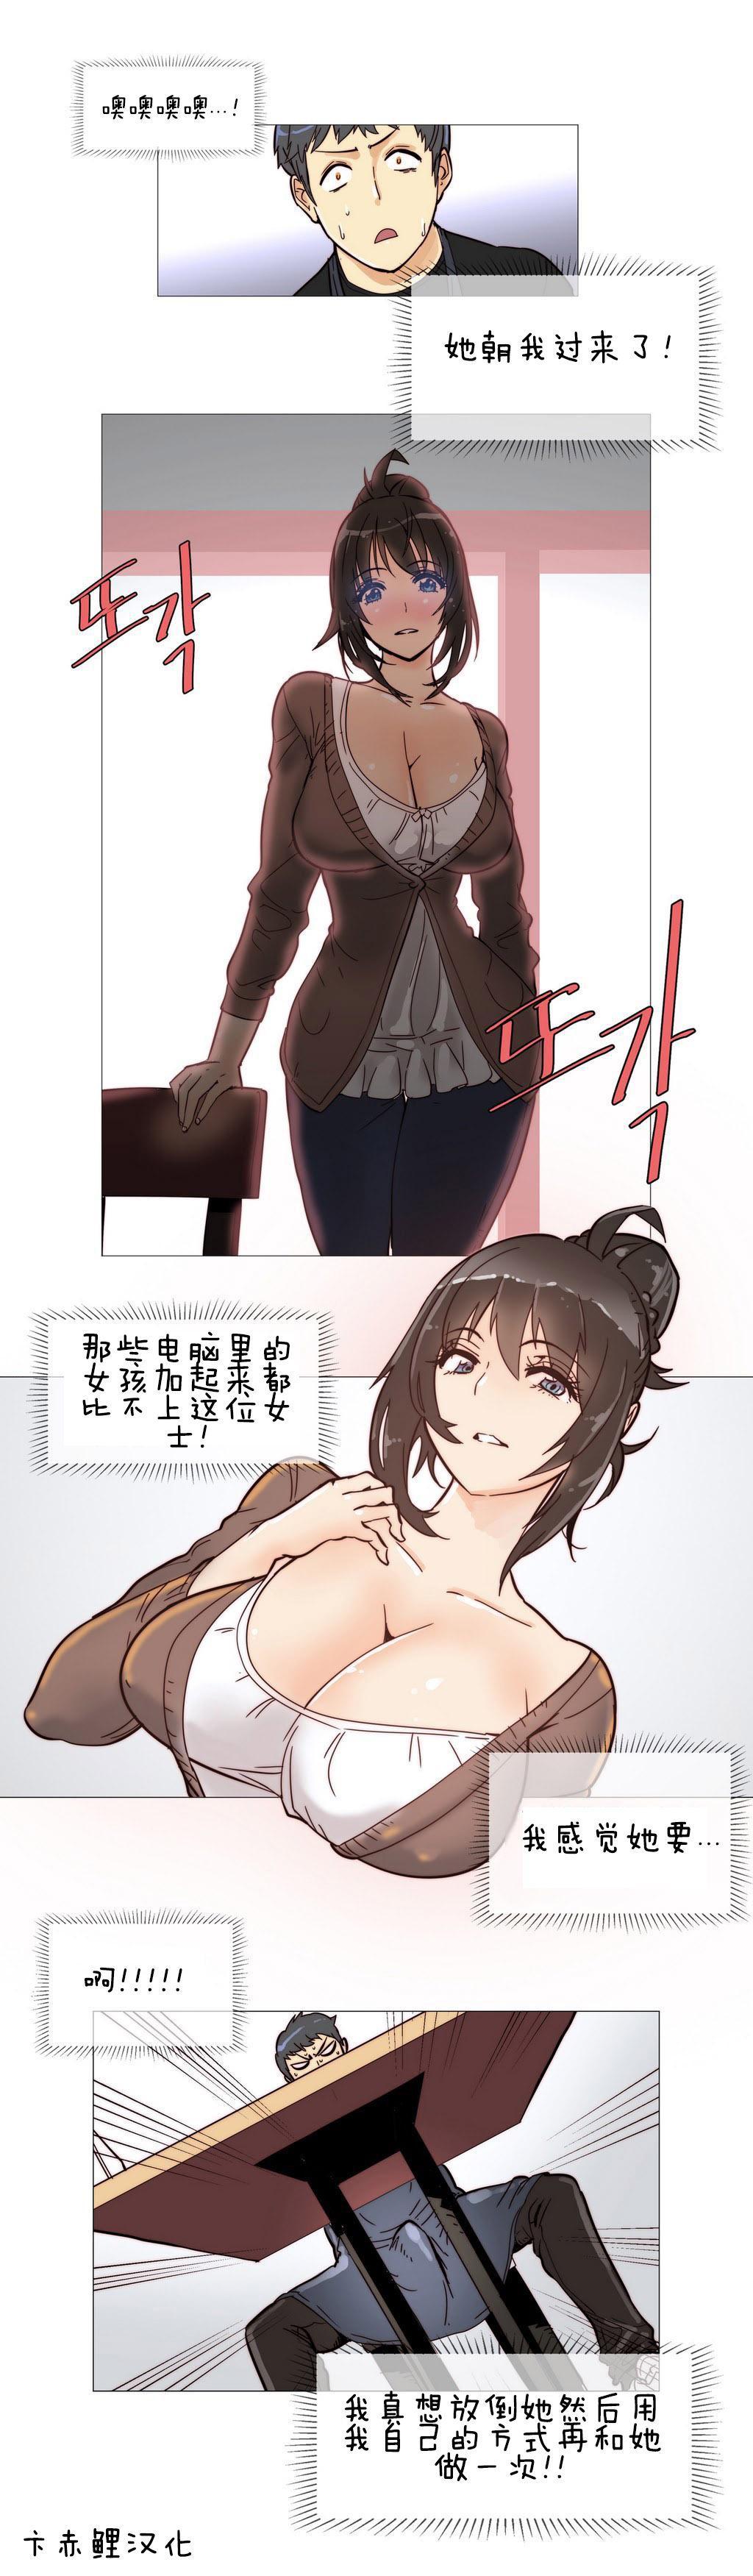 HouseHold Affairs 【卞赤鲤个人汉化】1~21话(持续更新中) 67